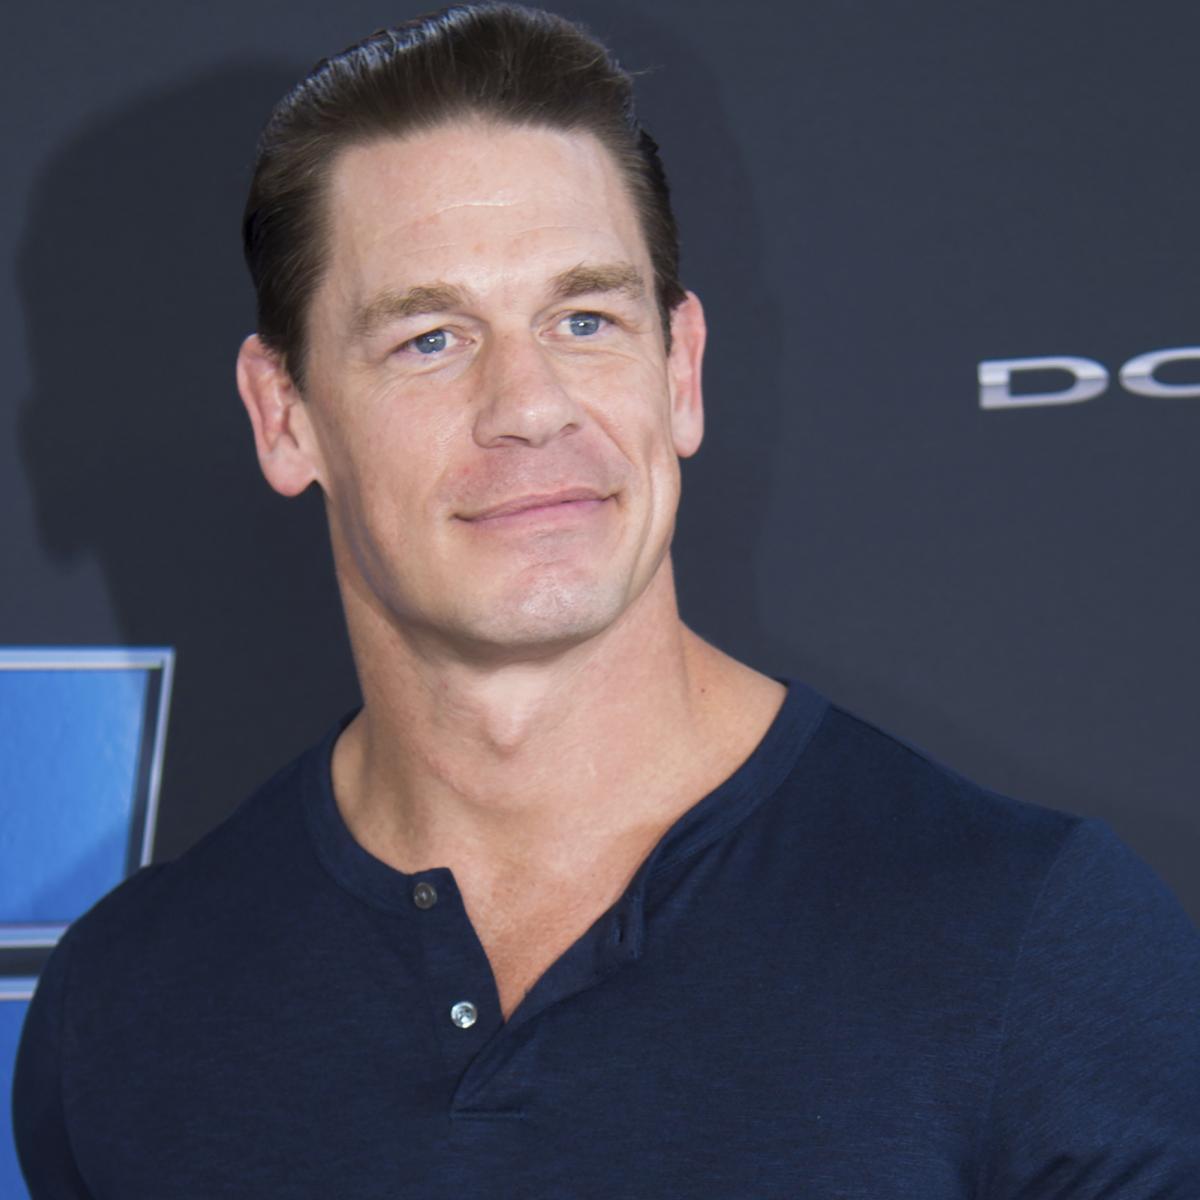 Predictions for John Cena, Goldberg and the Biggest Stars at SummerSlam